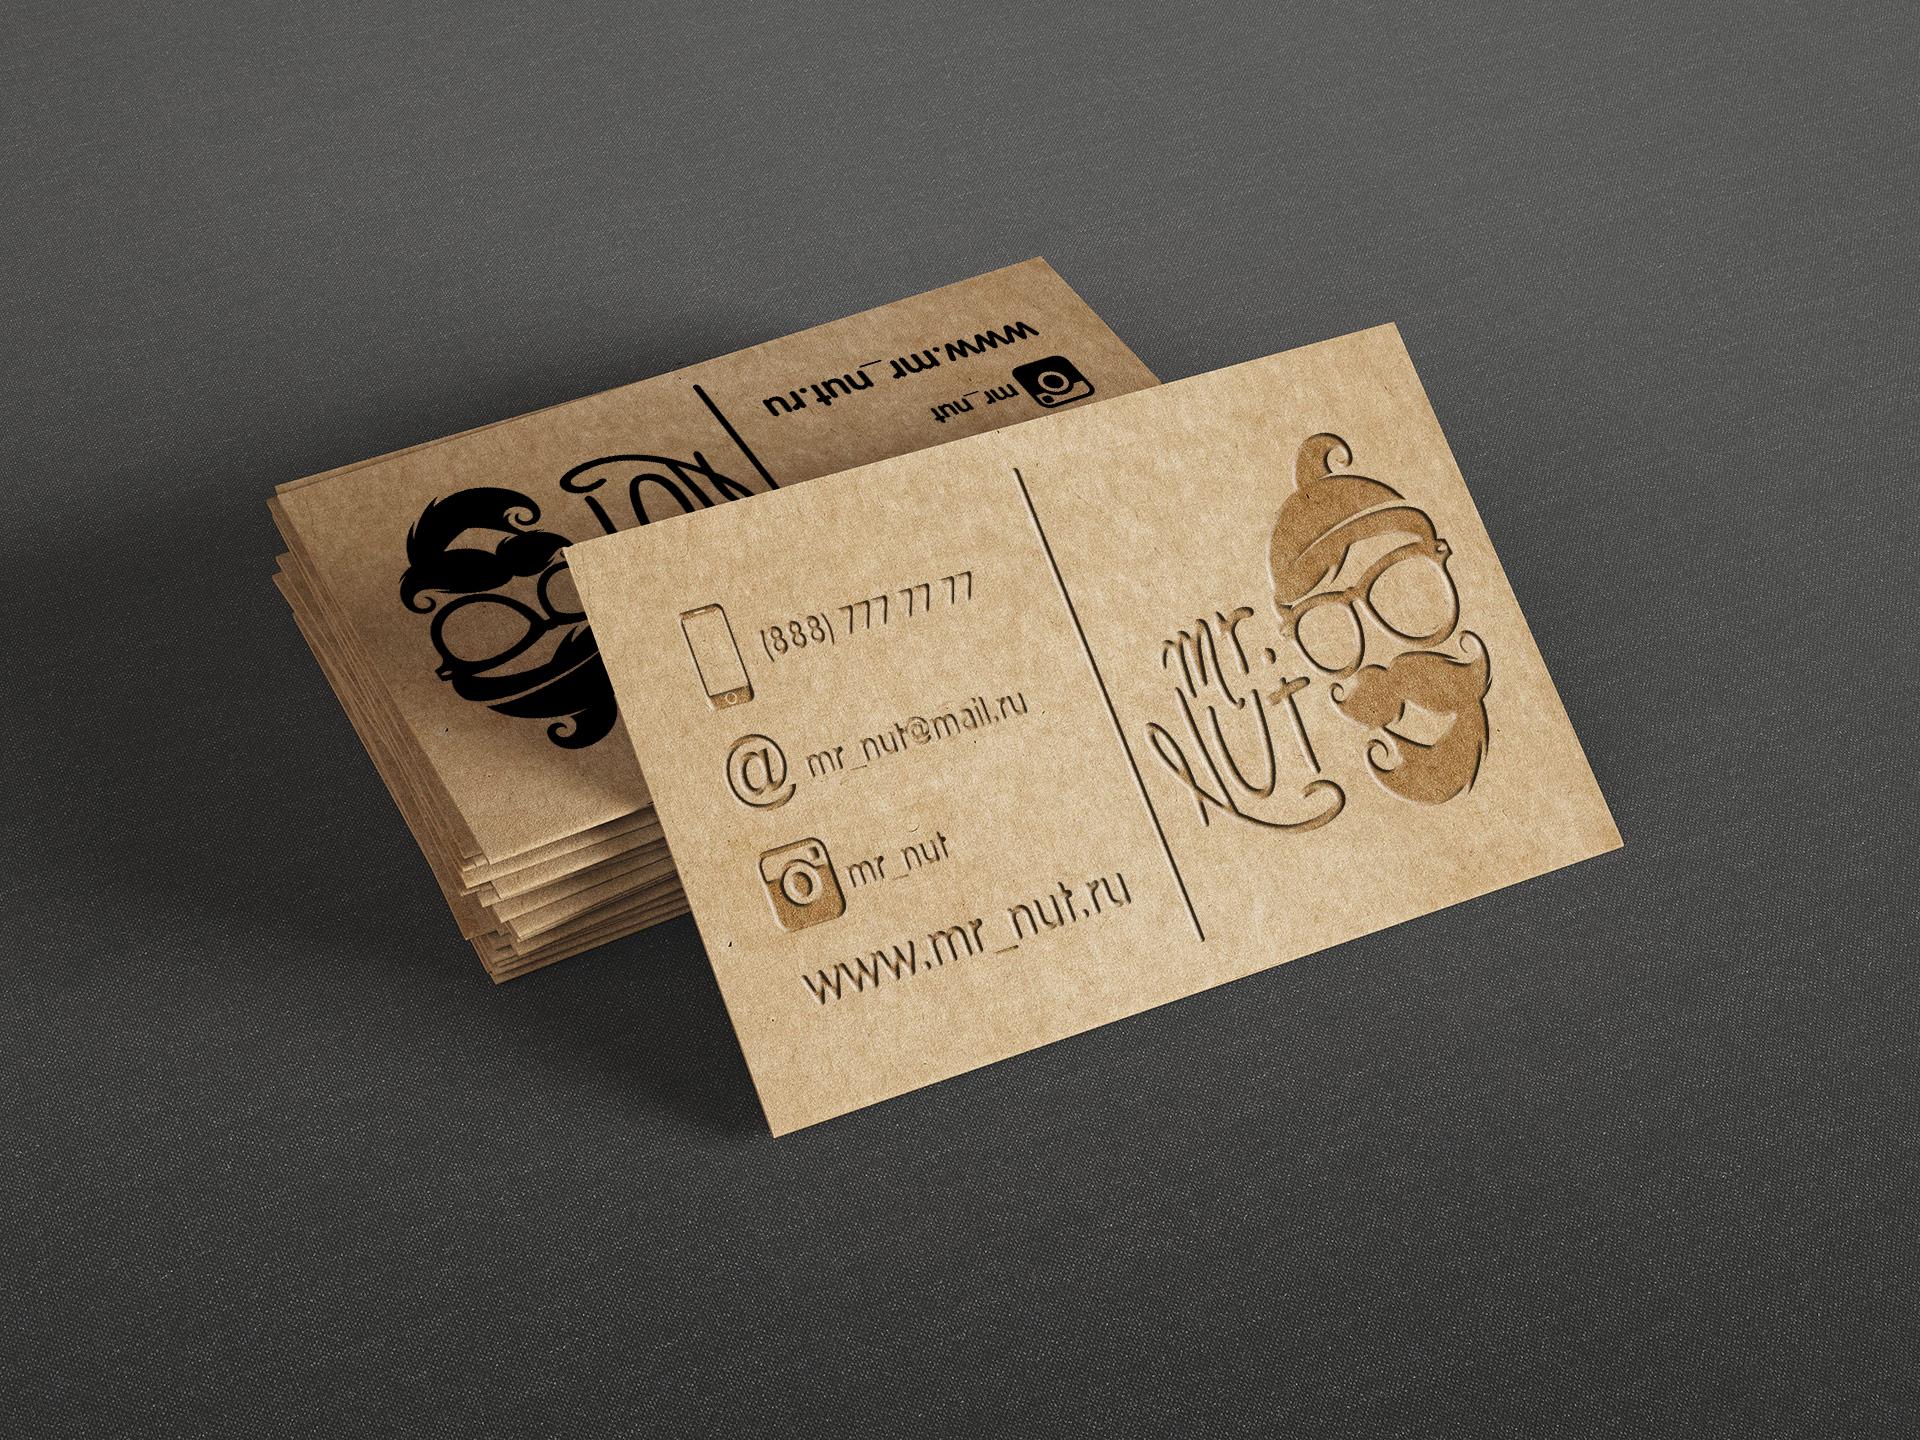 Разработать логотип и визитку фото f_08858f73bad3c018.jpg